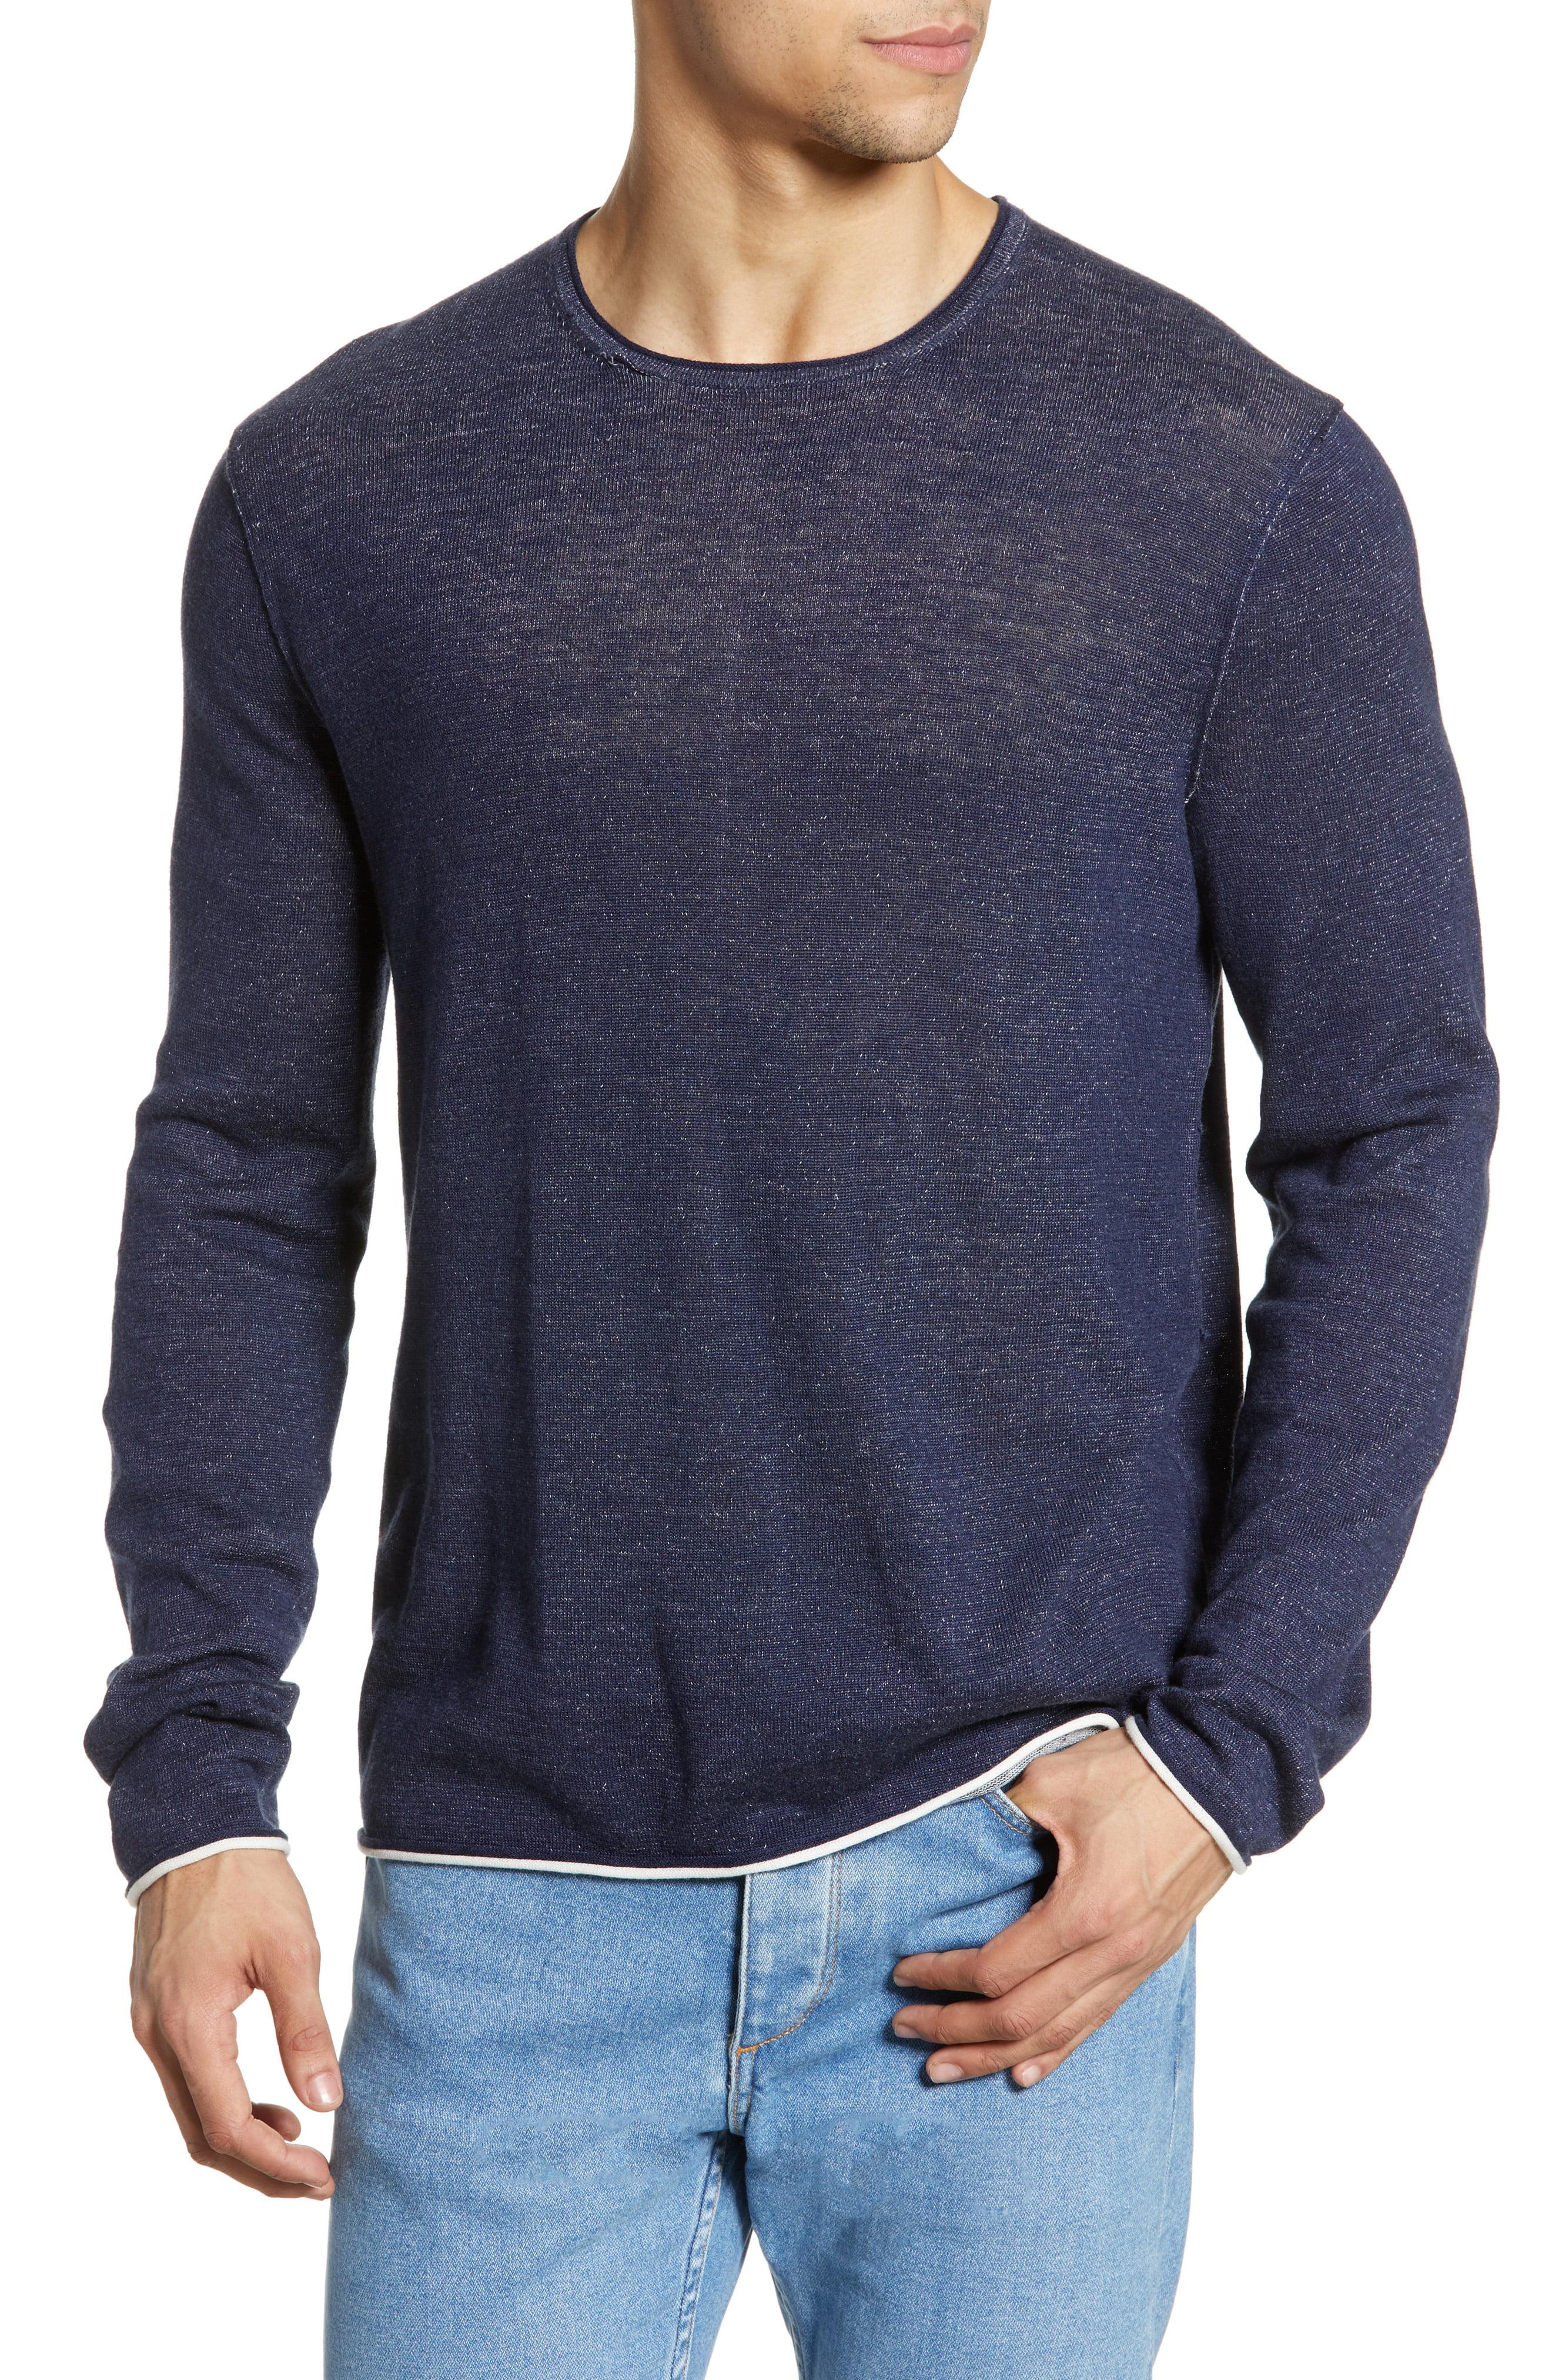 Men's Rag & Bone Trent Crewneck Sweater, Size Medium - Blue